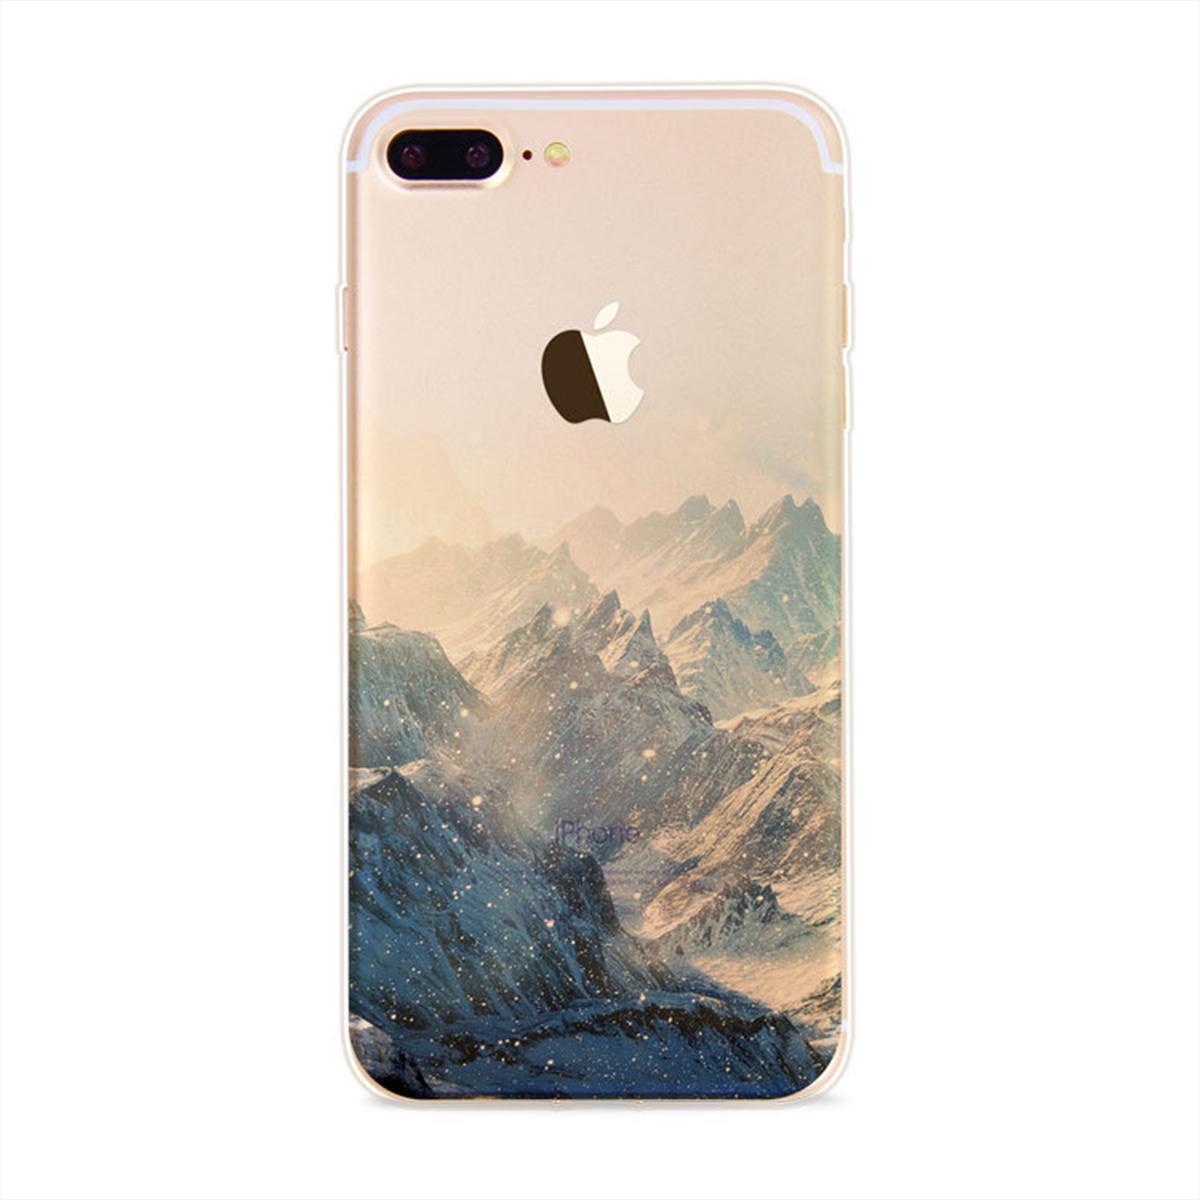 NOXCASE Softcase für iPhone 7 Plus - Berge